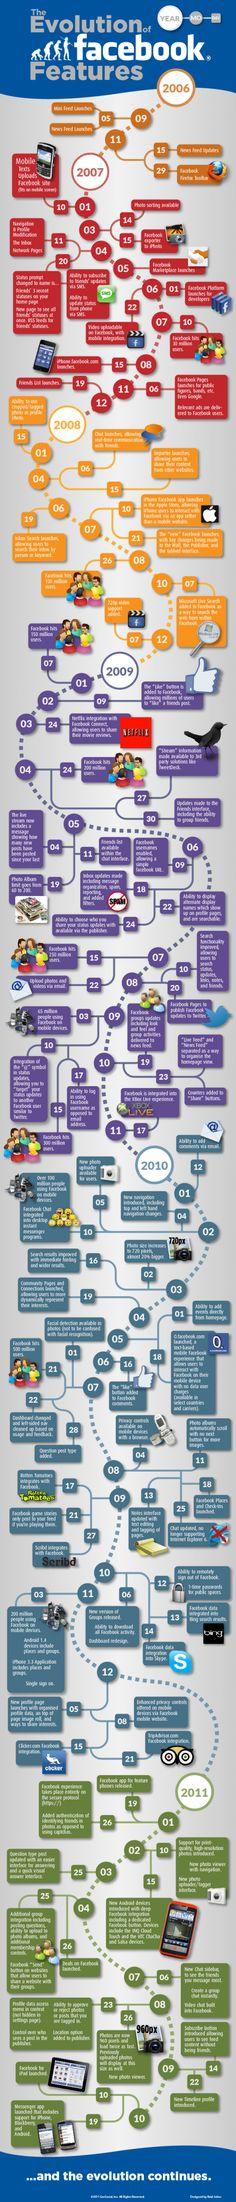 The evolution of Facebook features - TalkDigital